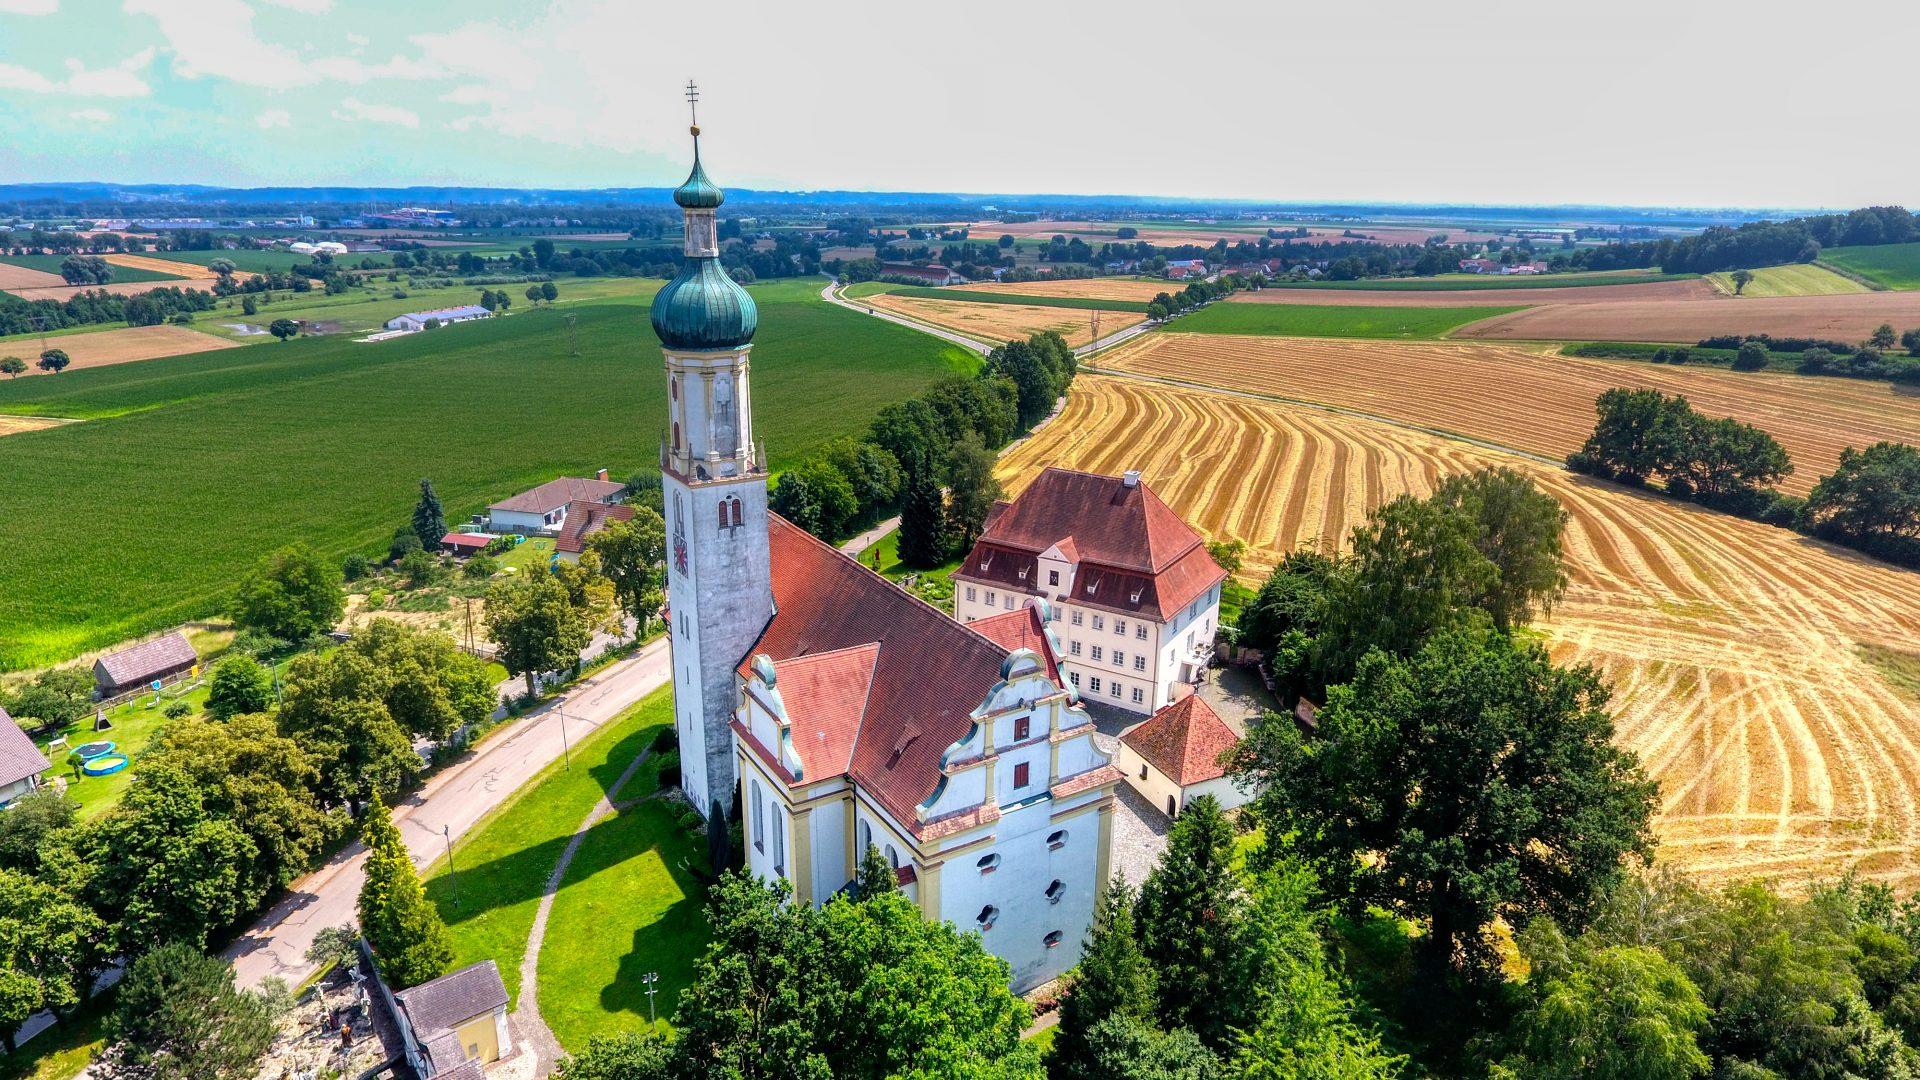 Luftbild Kirche Biberbach Foto: Sascha Oberman